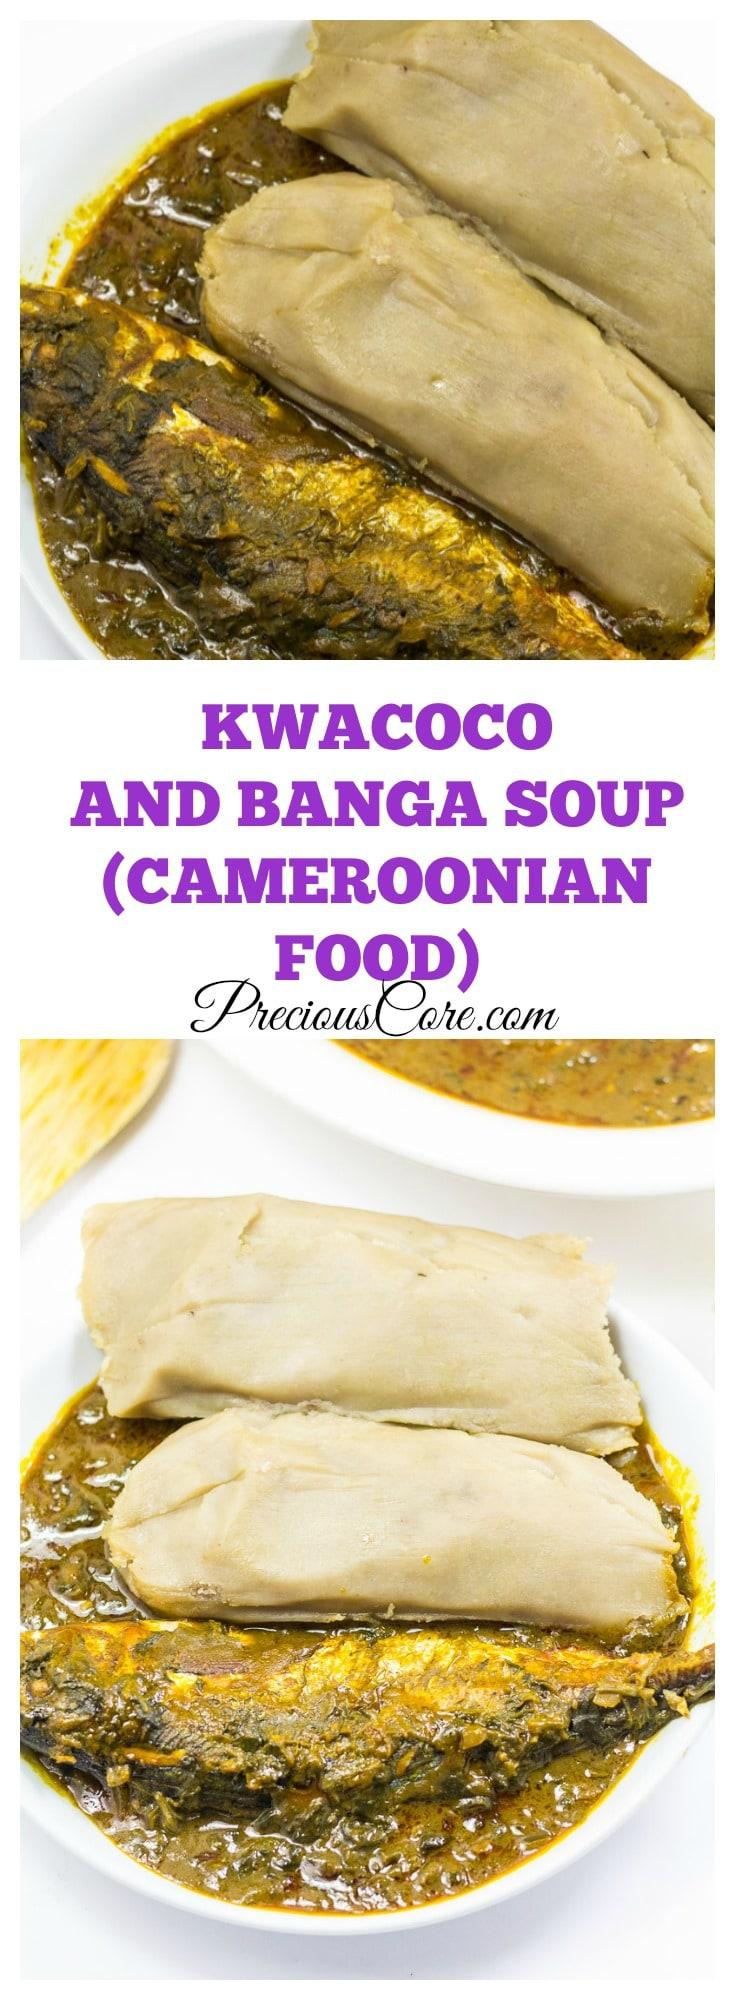 Kwacoco and Banga Soup - Cameroonian Food